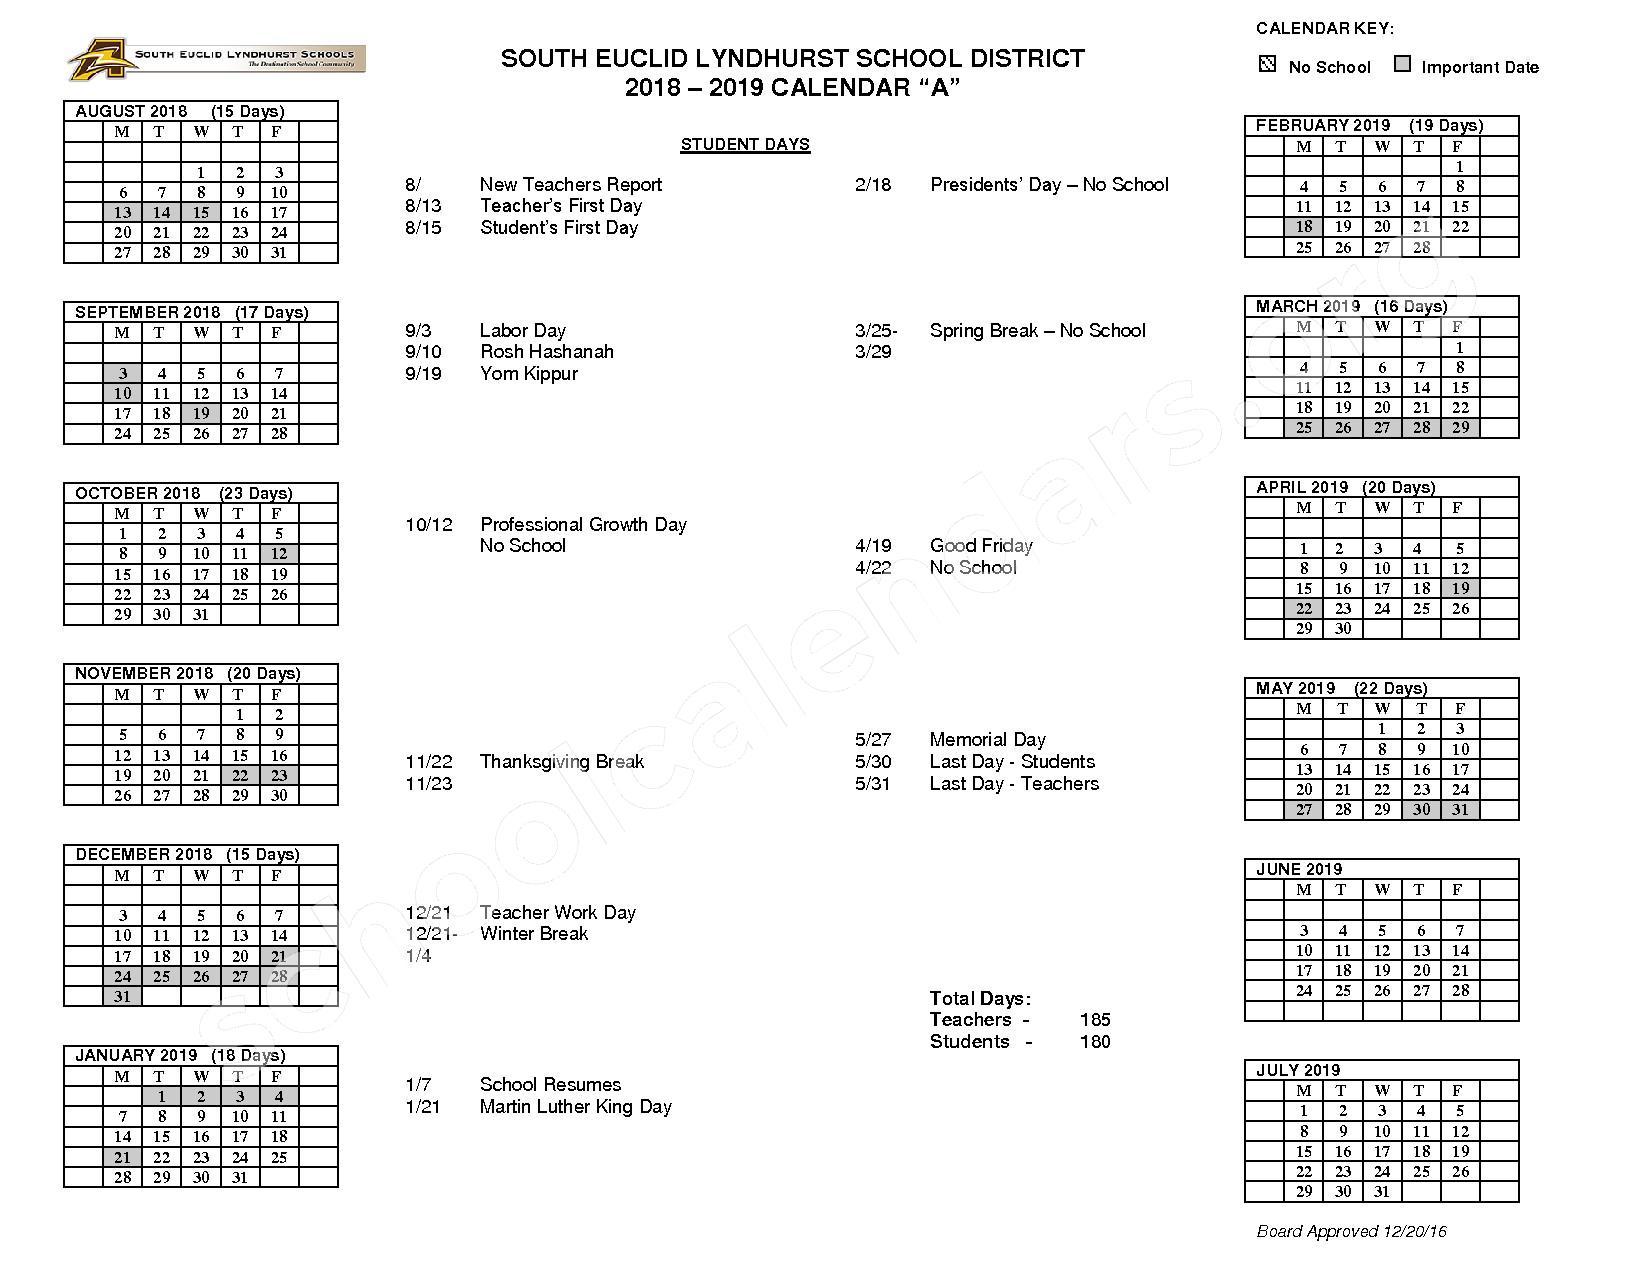 South Euclid-Lyndhurst Schools Calendars – Lyndhurst, Oh throughout South Euclid Lyndhurst Calendar